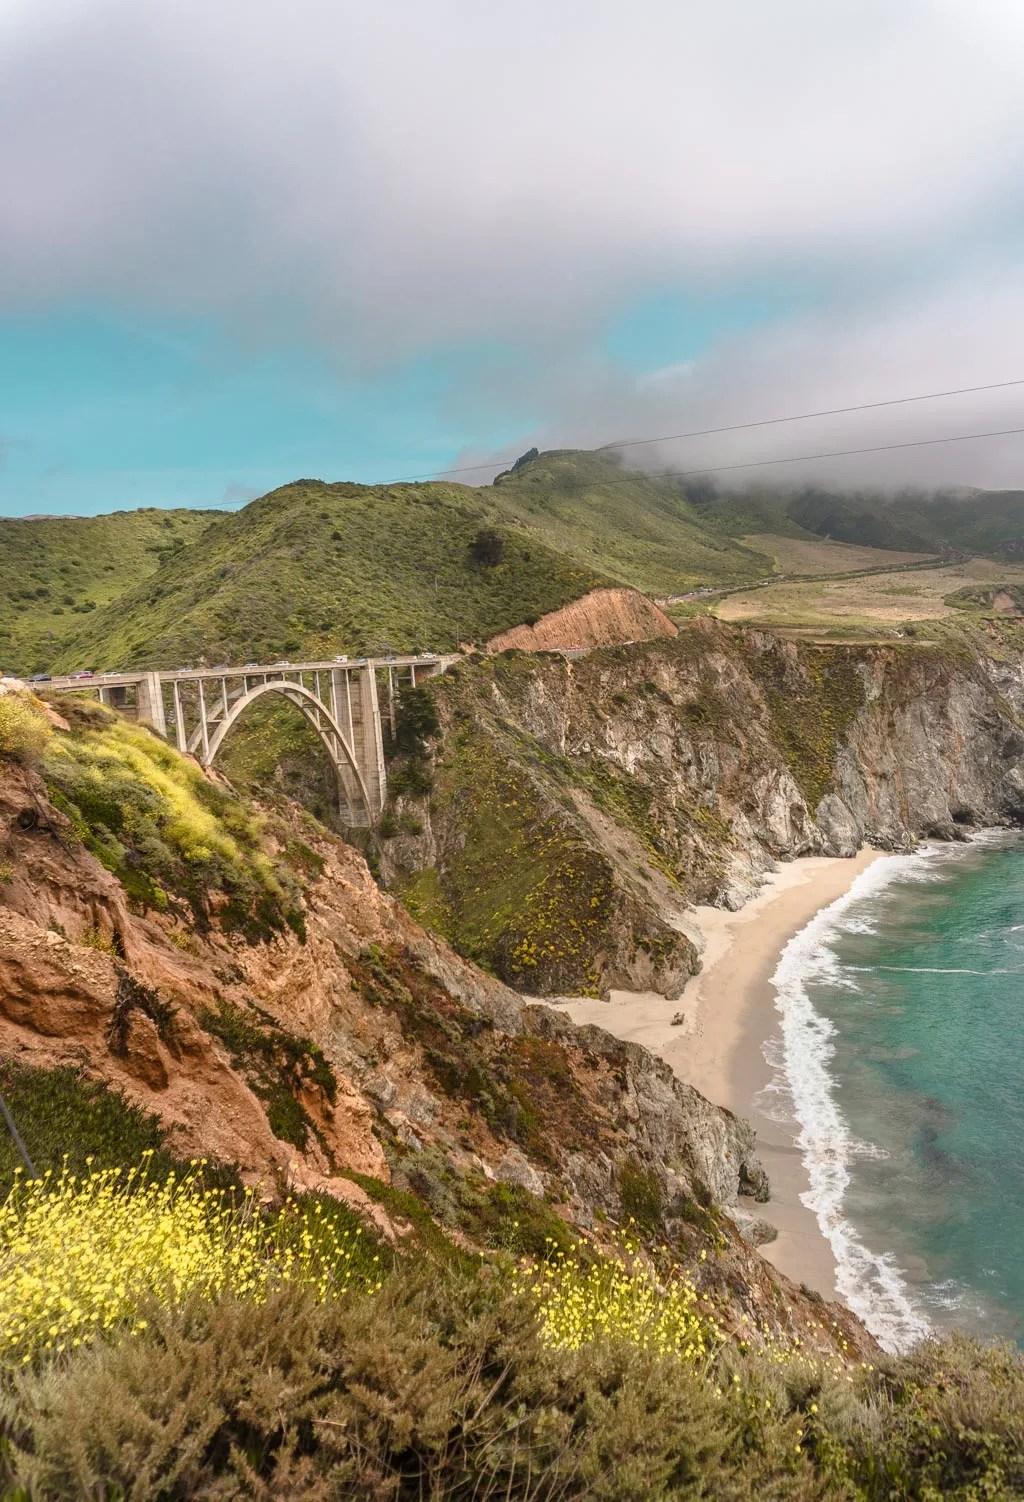 Bixby Bridge in Big Sur on the California Coast